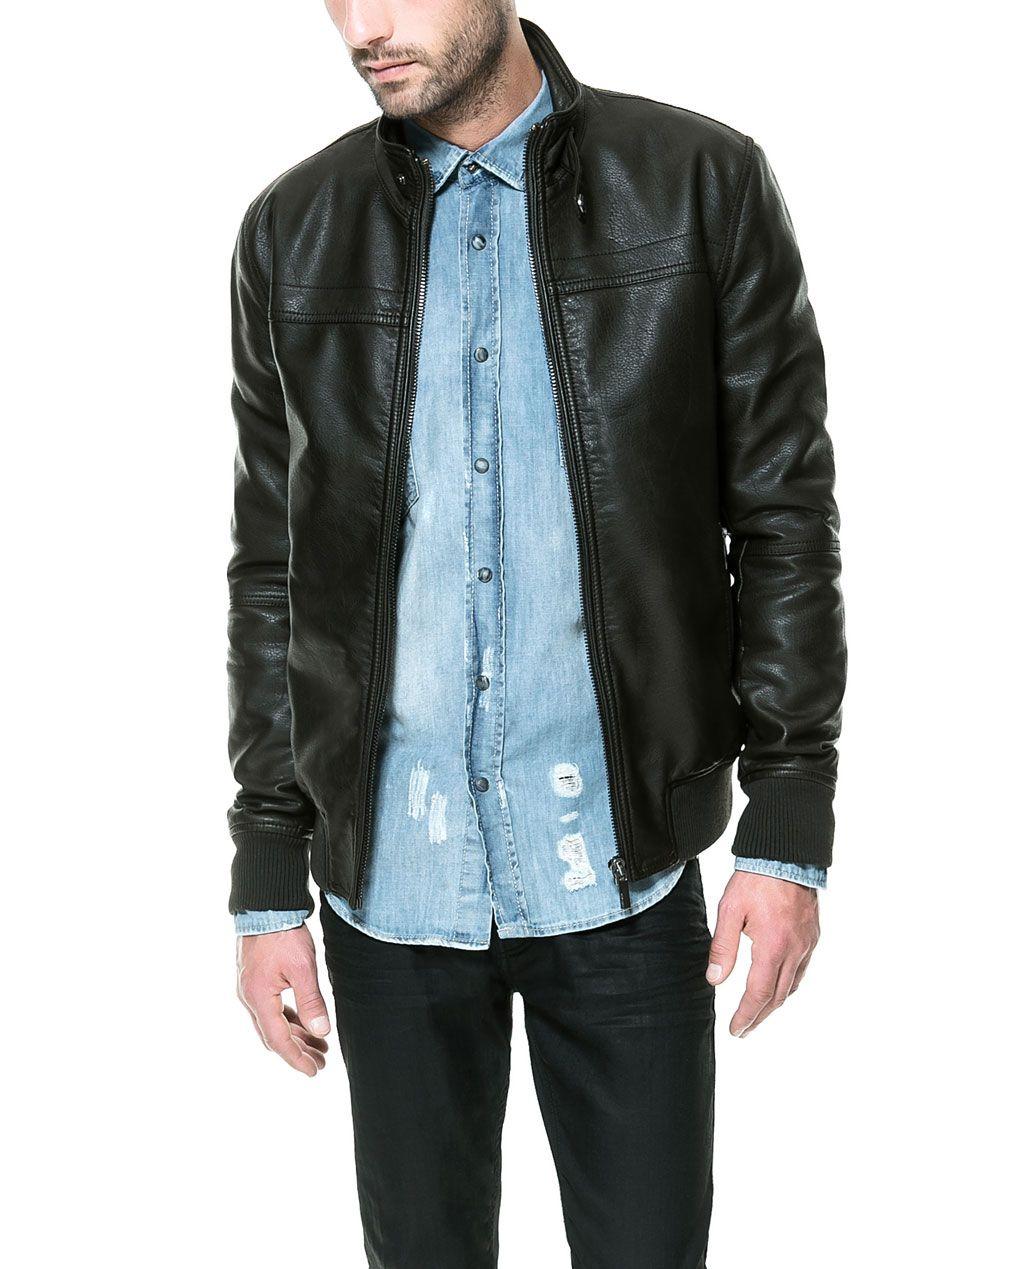 GREEN FAUX LEATHER JACKET from Zara Zara leather jacket